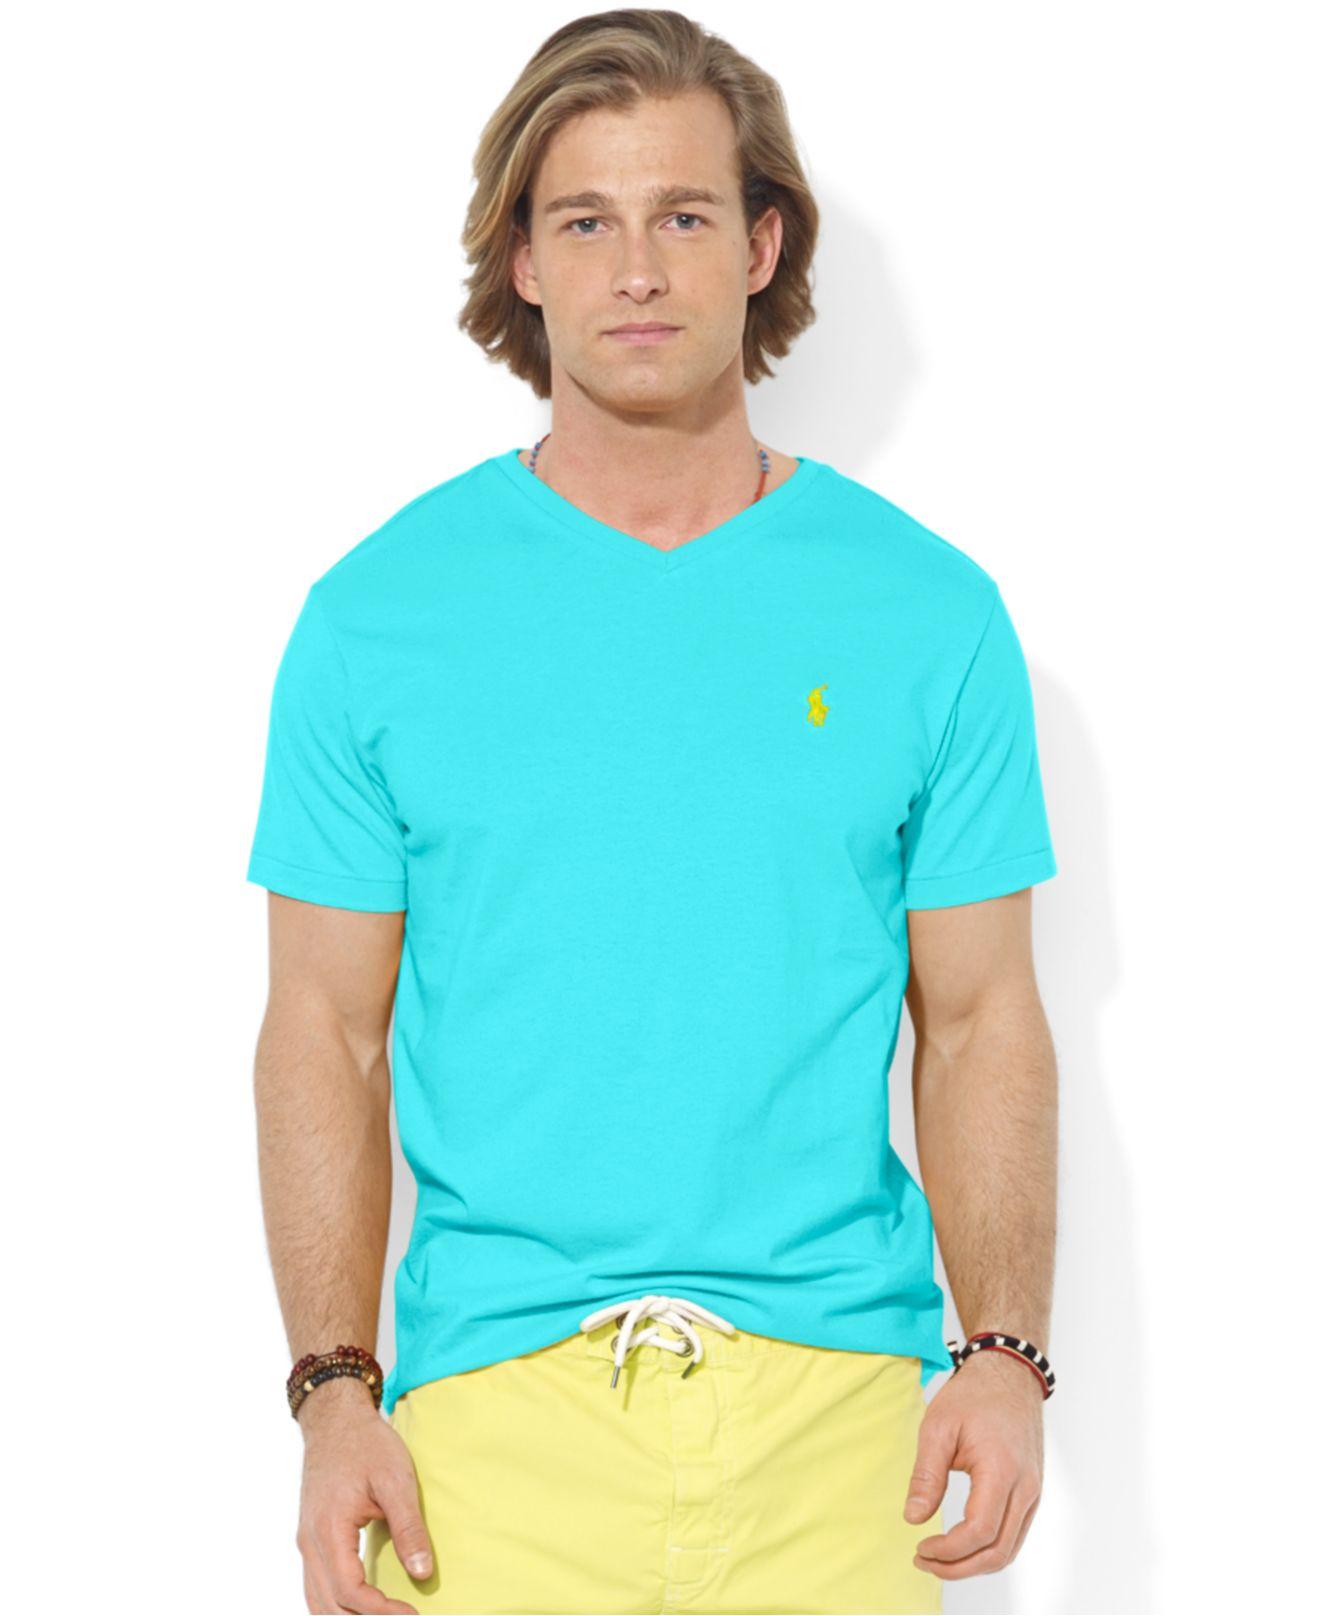 ca777bbd2ce Lyst - Polo Ralph Lauren Jersey V-neck T-shirt in Blue for Men